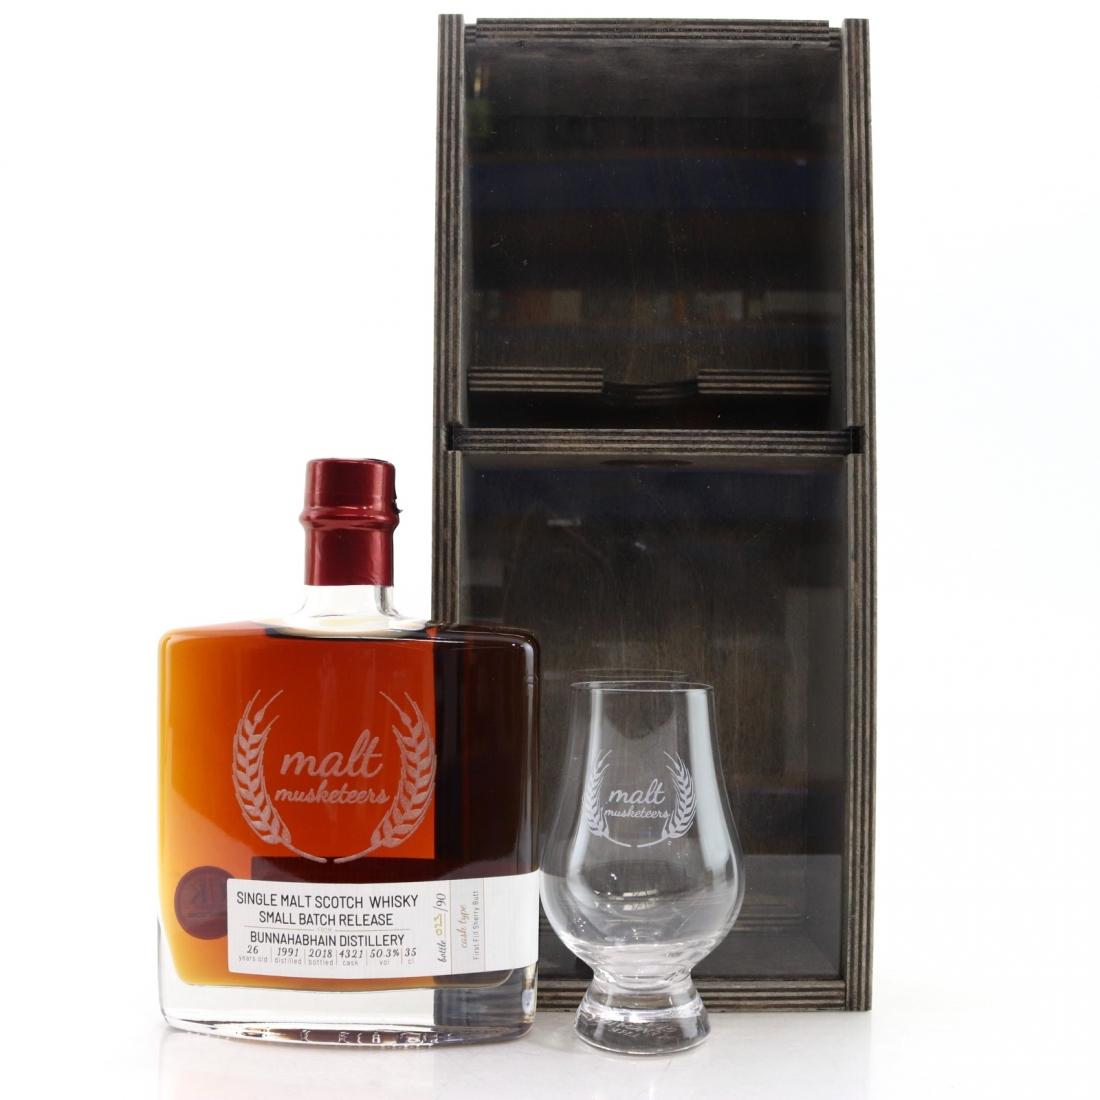 Bunnahabhain 1991 Malt Musketeers 26 Year Old 35cl / Including Glass